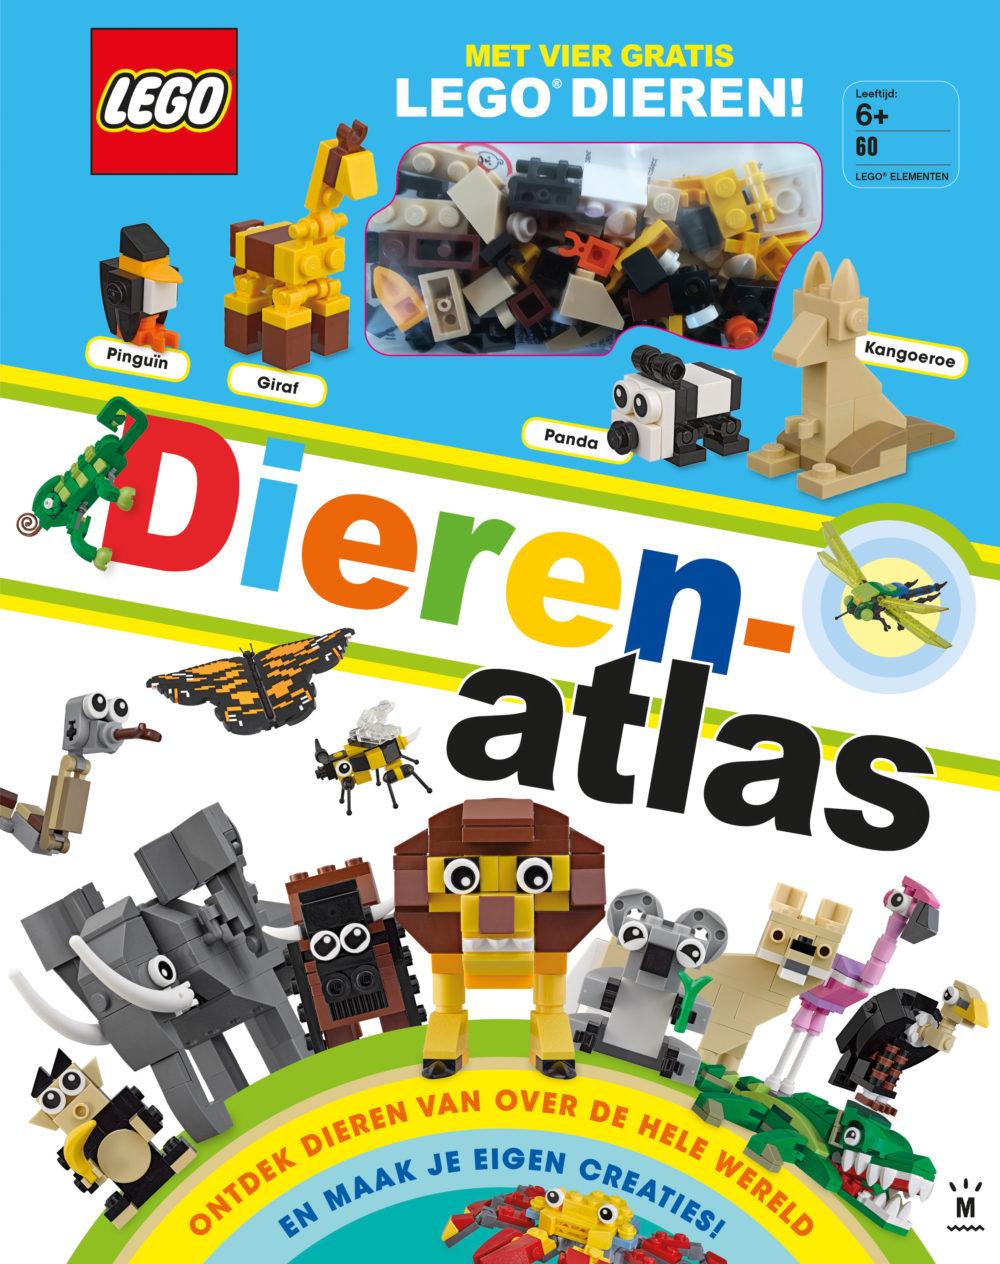 LEGO DIERENATLAS COVER HR MET STEENTJES